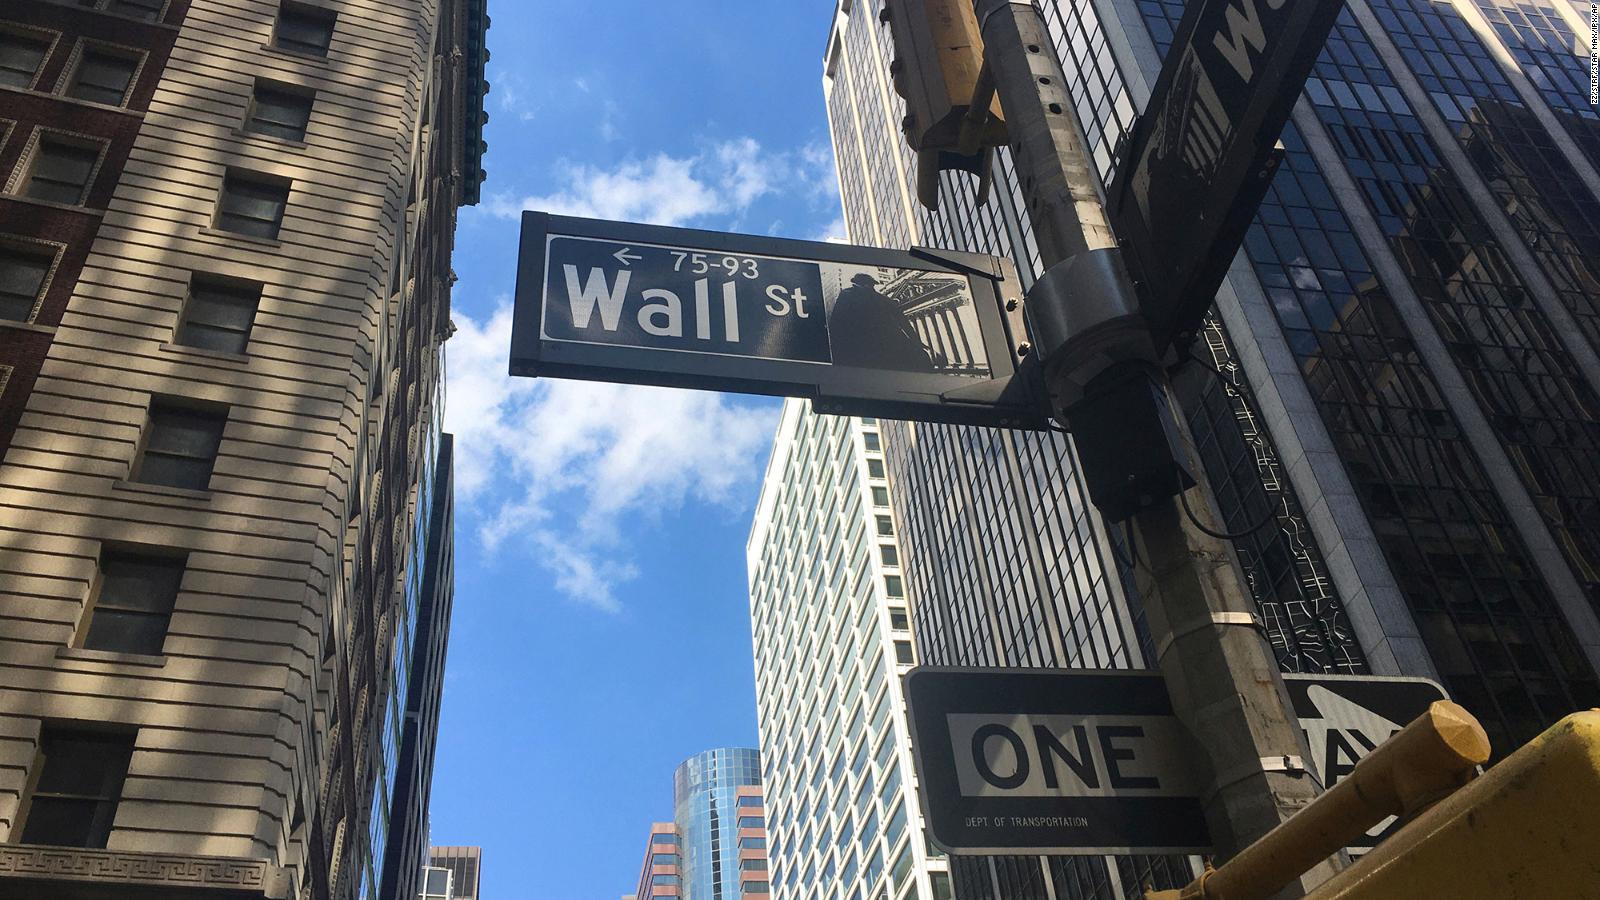 Stock market bloodbath: Dow and Nasdaq plummet in the worst day since June  - CNN